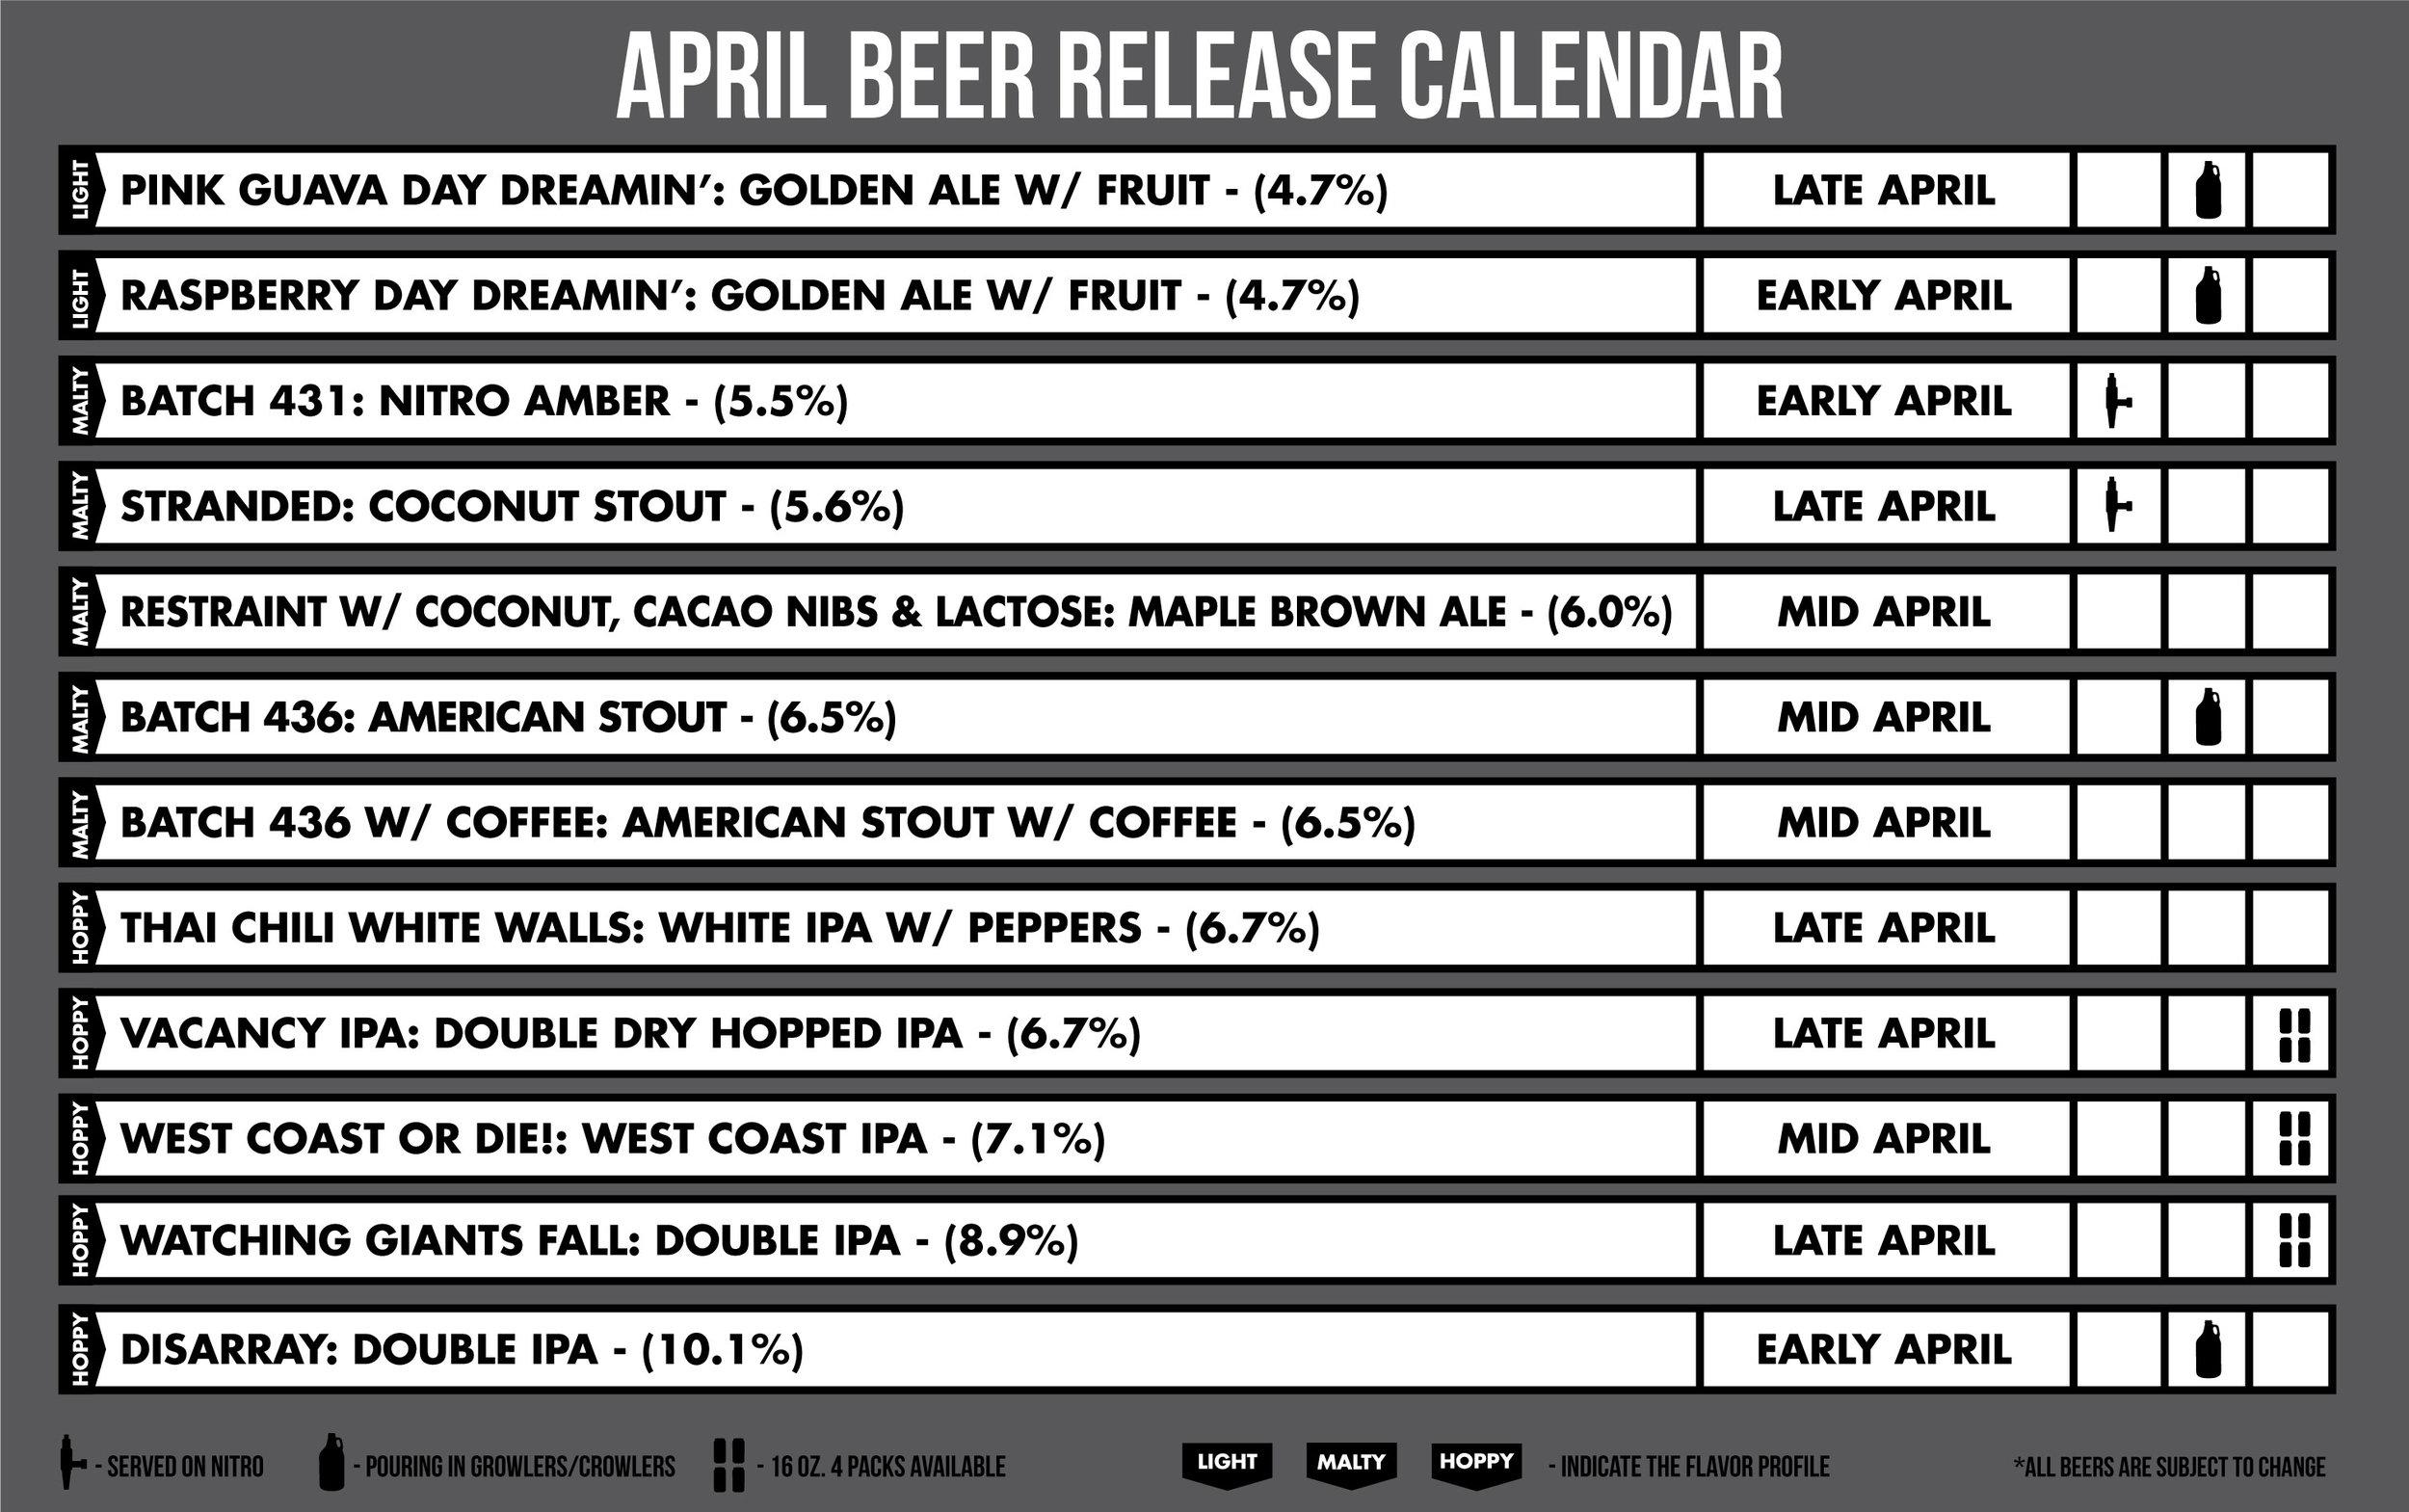 April_2019_Beer_Release_Calendar.jpg